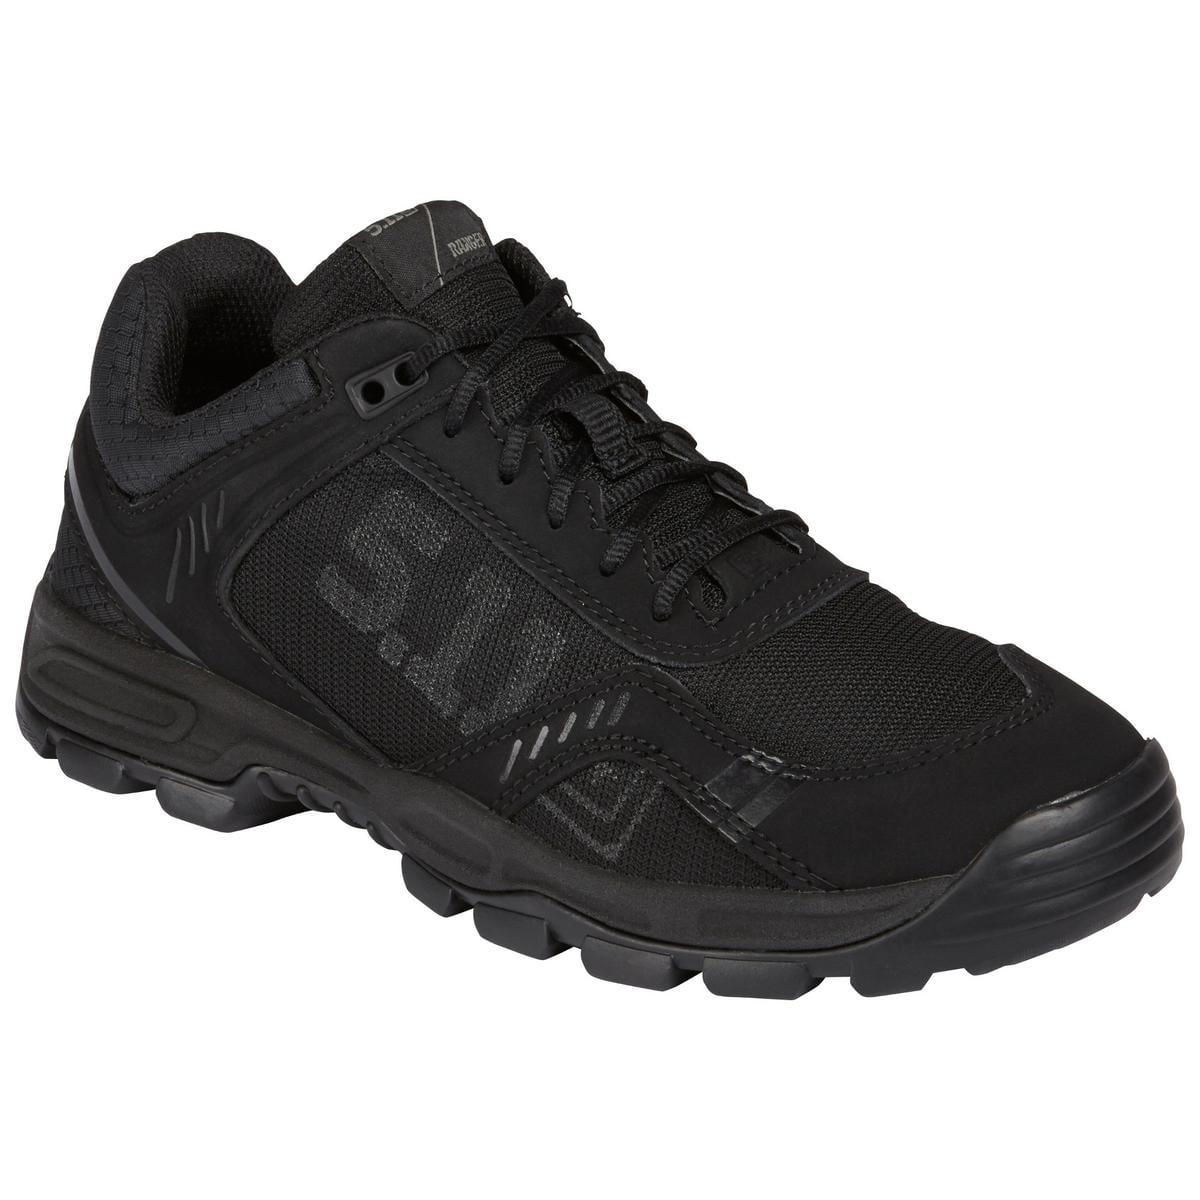 5.11 Tactical Ranger Athletic Shoe